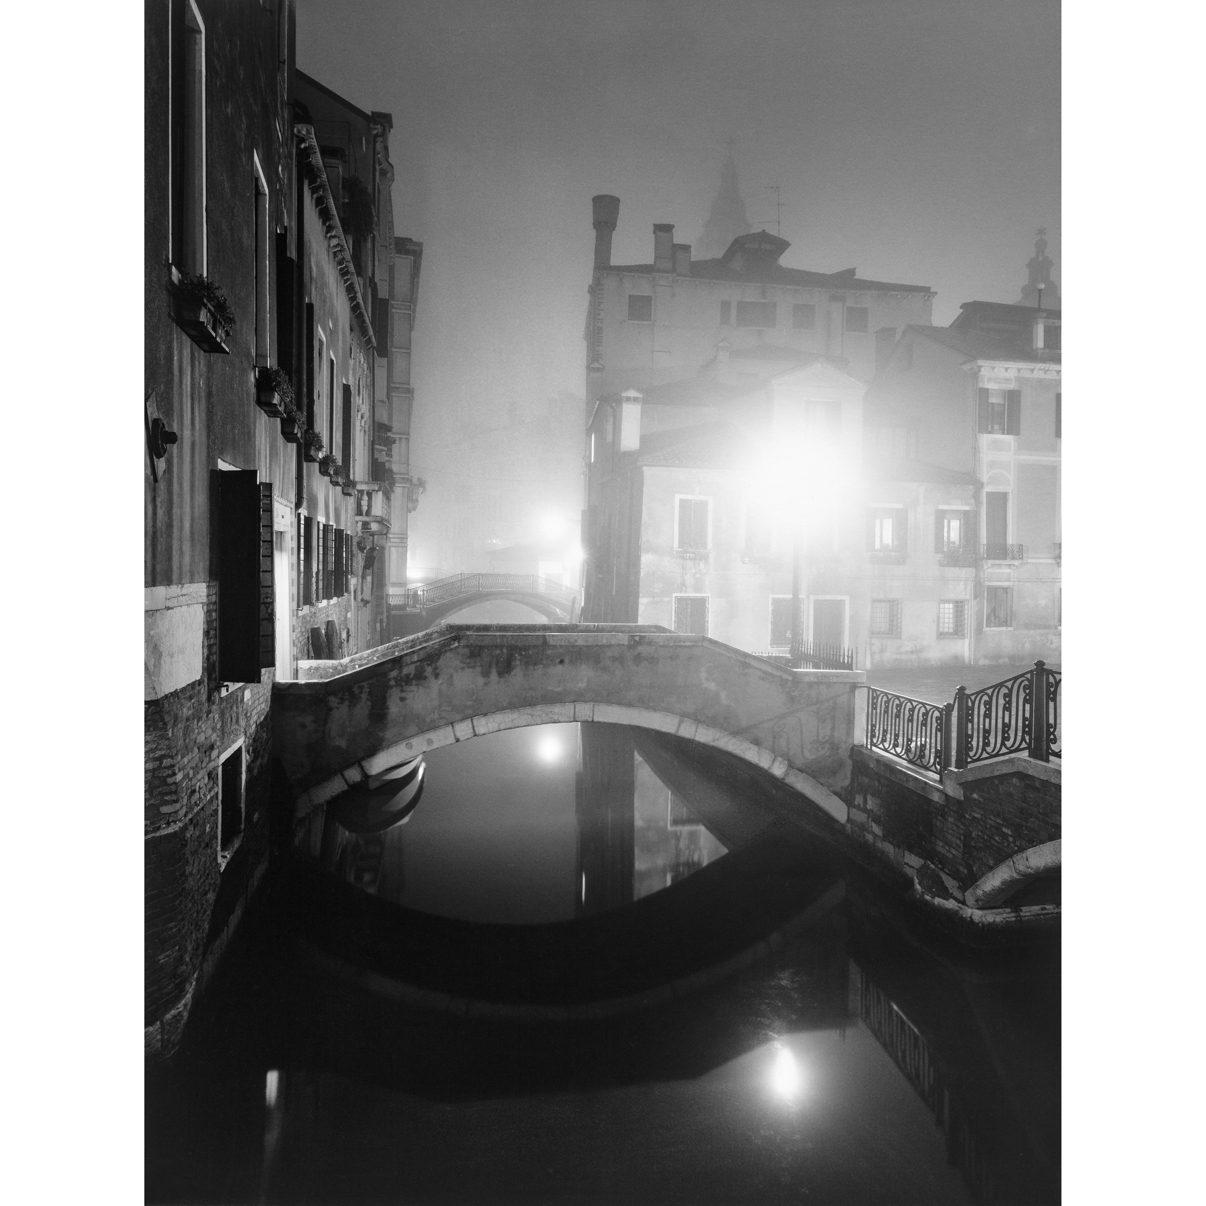 2015 Arca Swiss 4x5 Venice Italy MGFB Classic 1K